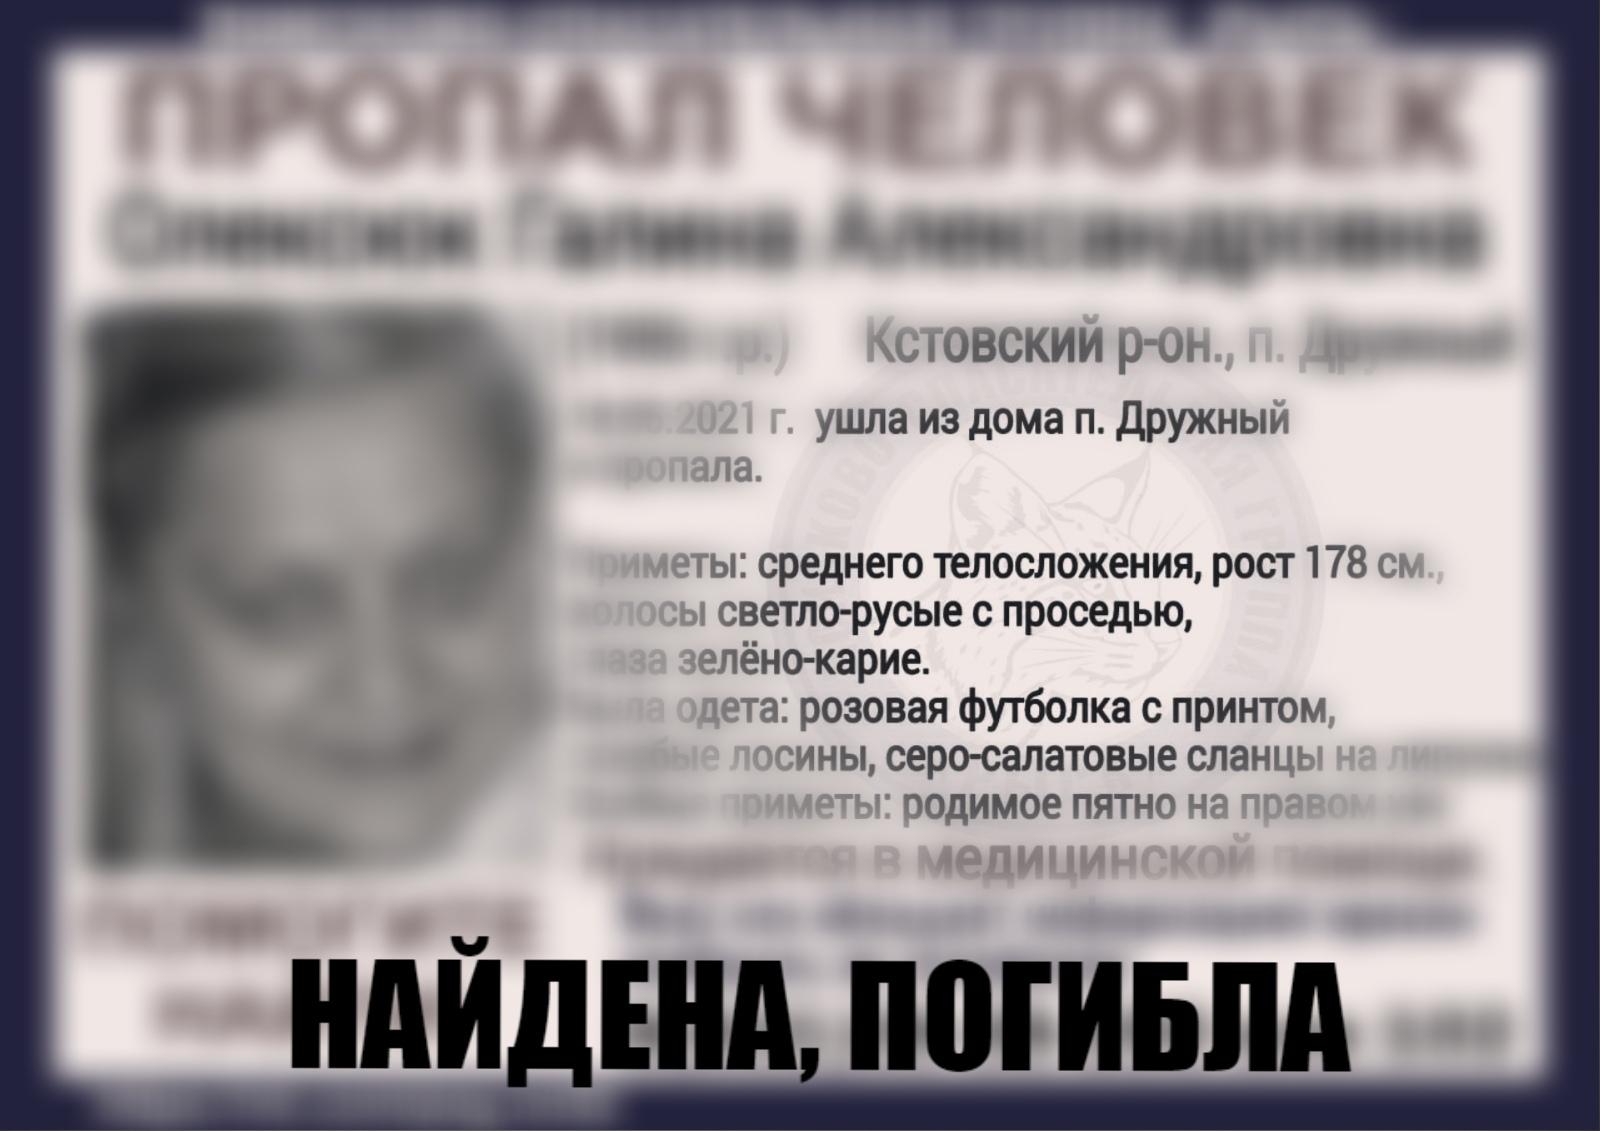 Олексюк Галина Александровна, 1956 г.р., Кстовский р-н, п. Дружный